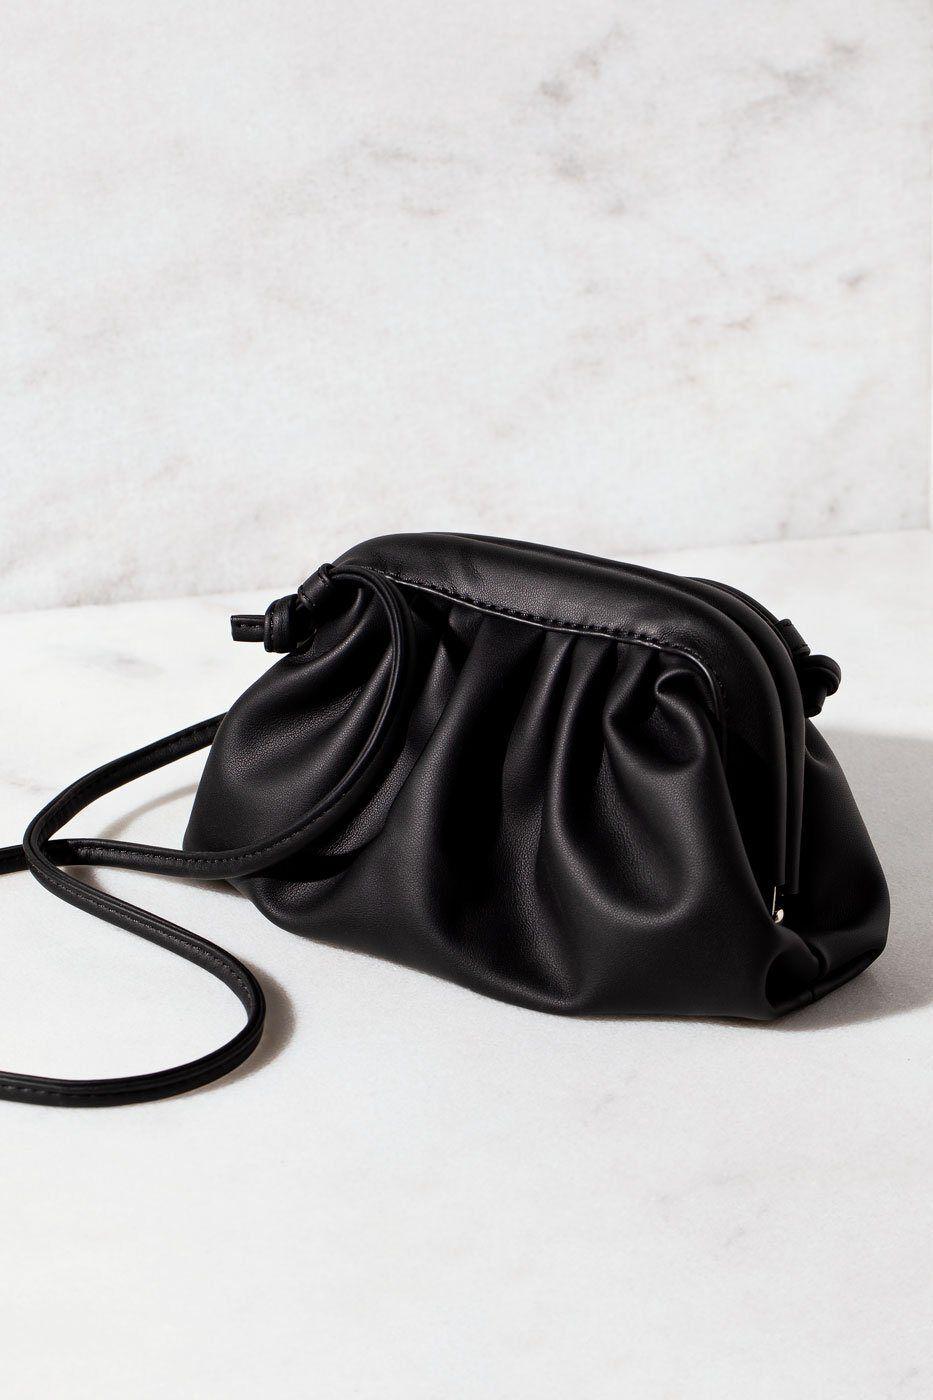 Impulse Fashion Accessories Cara Black Clamshell Clutch Purse  - G1464 Black